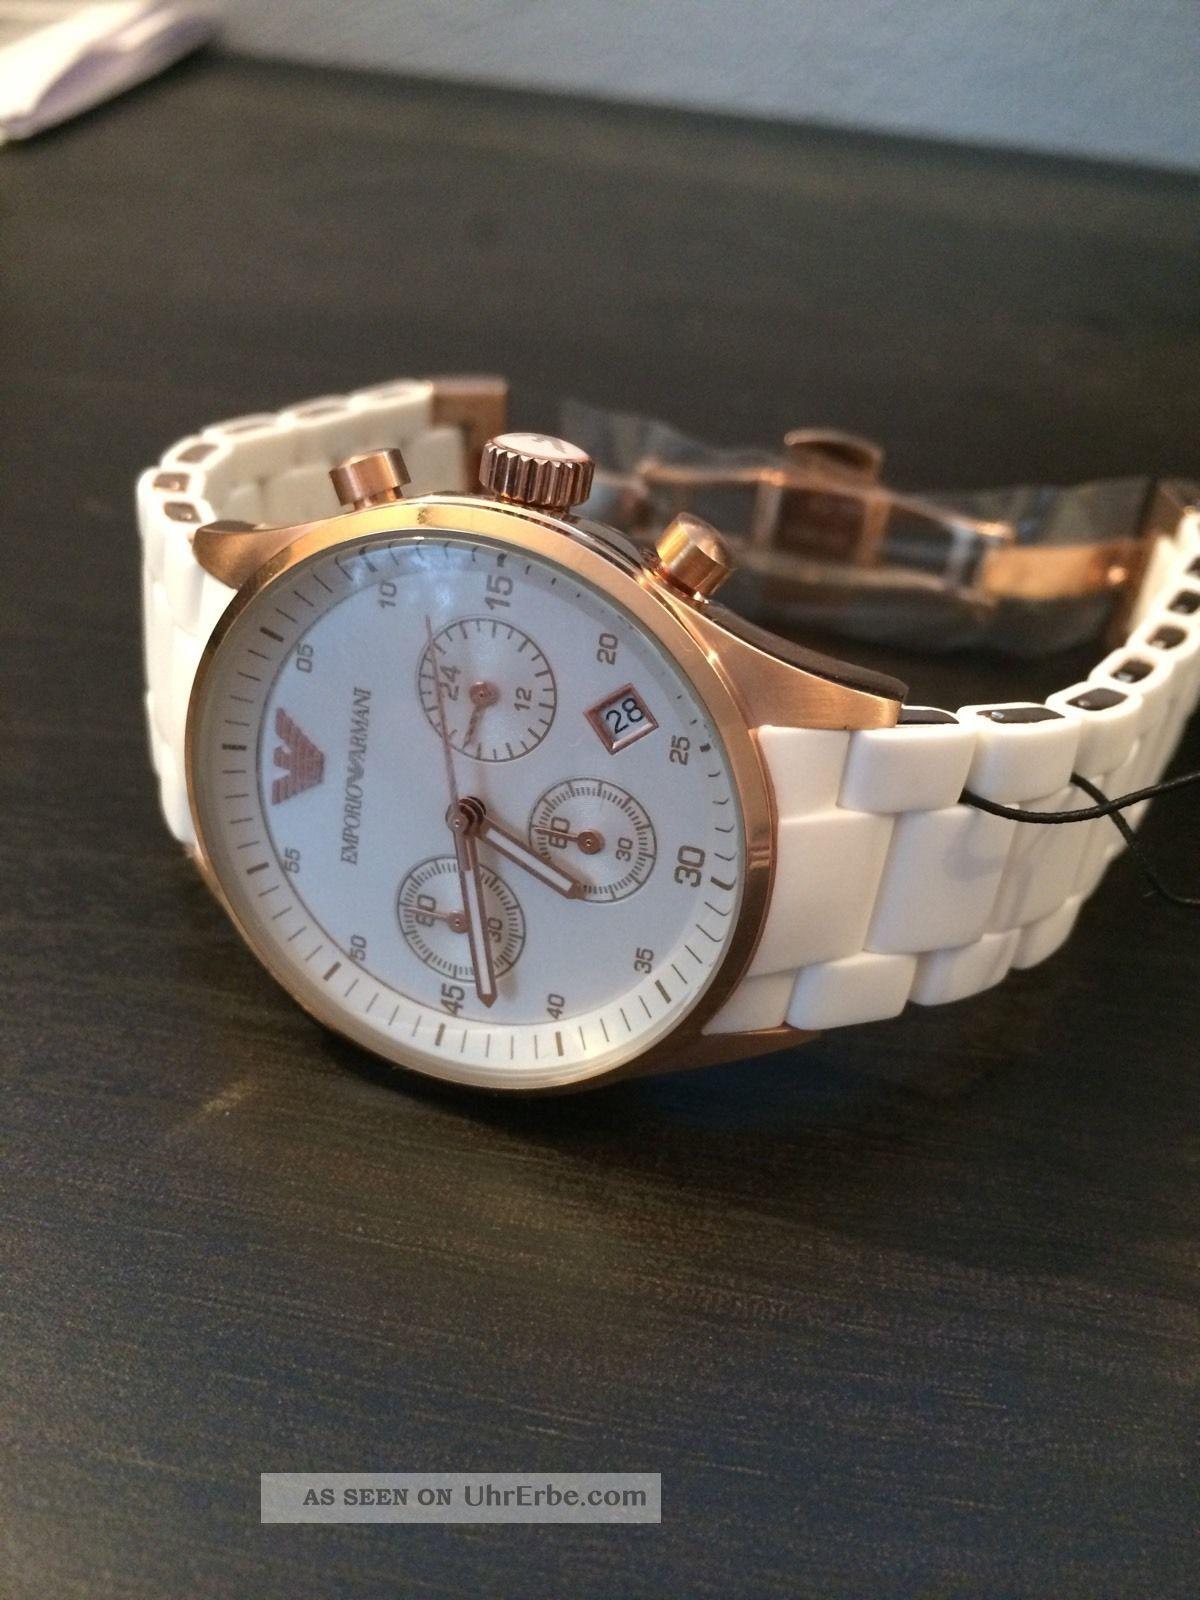 Emporio Armani Ar5920 Damenuhr Chronograph Mode Silikon/metall Armband Armbanduhren Bild